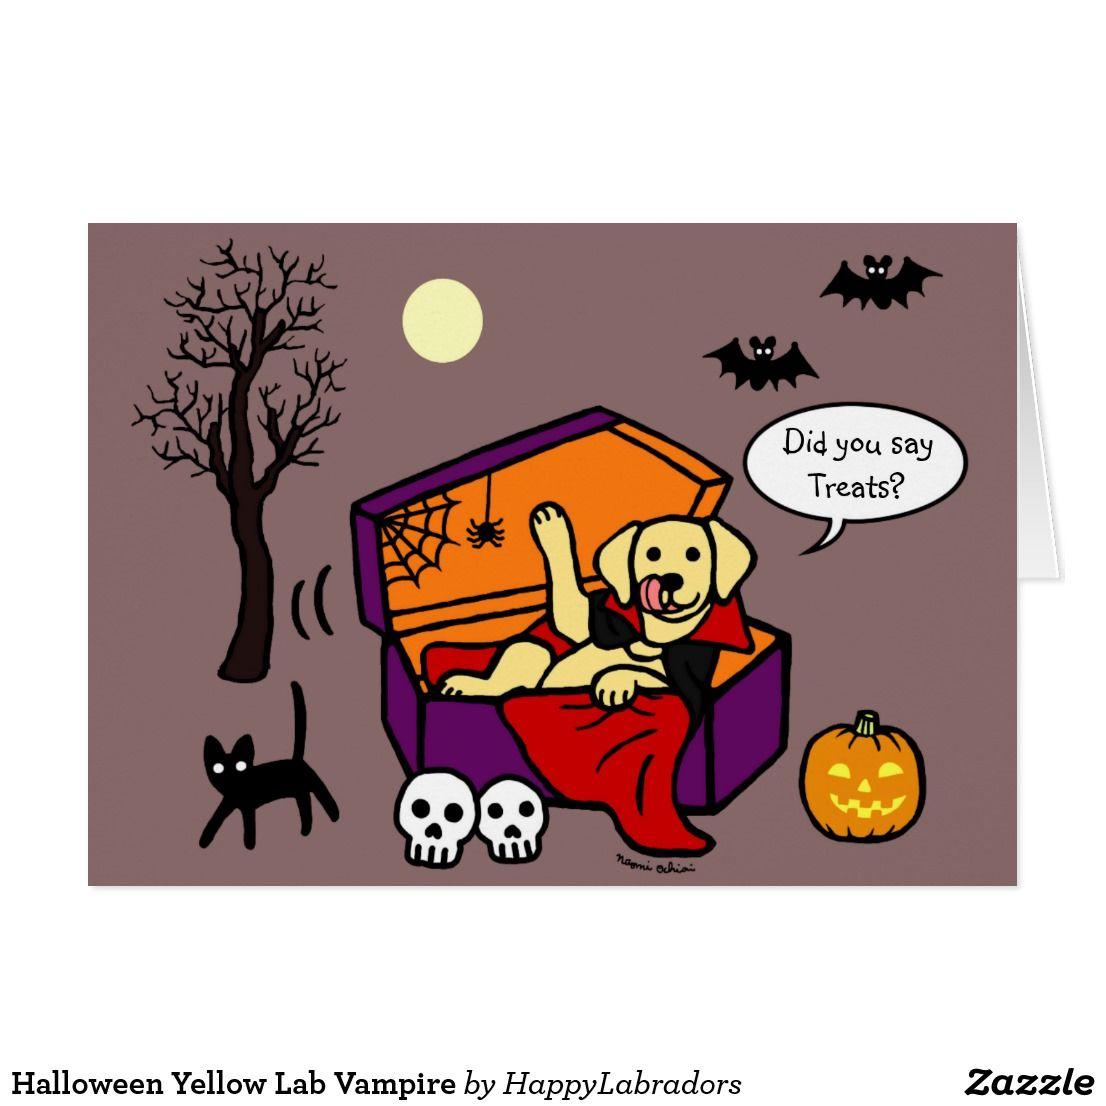 Halloween Yellow Lab Vampire Card Zazzle Com Halloween Chocolate Halloween Halloween Design